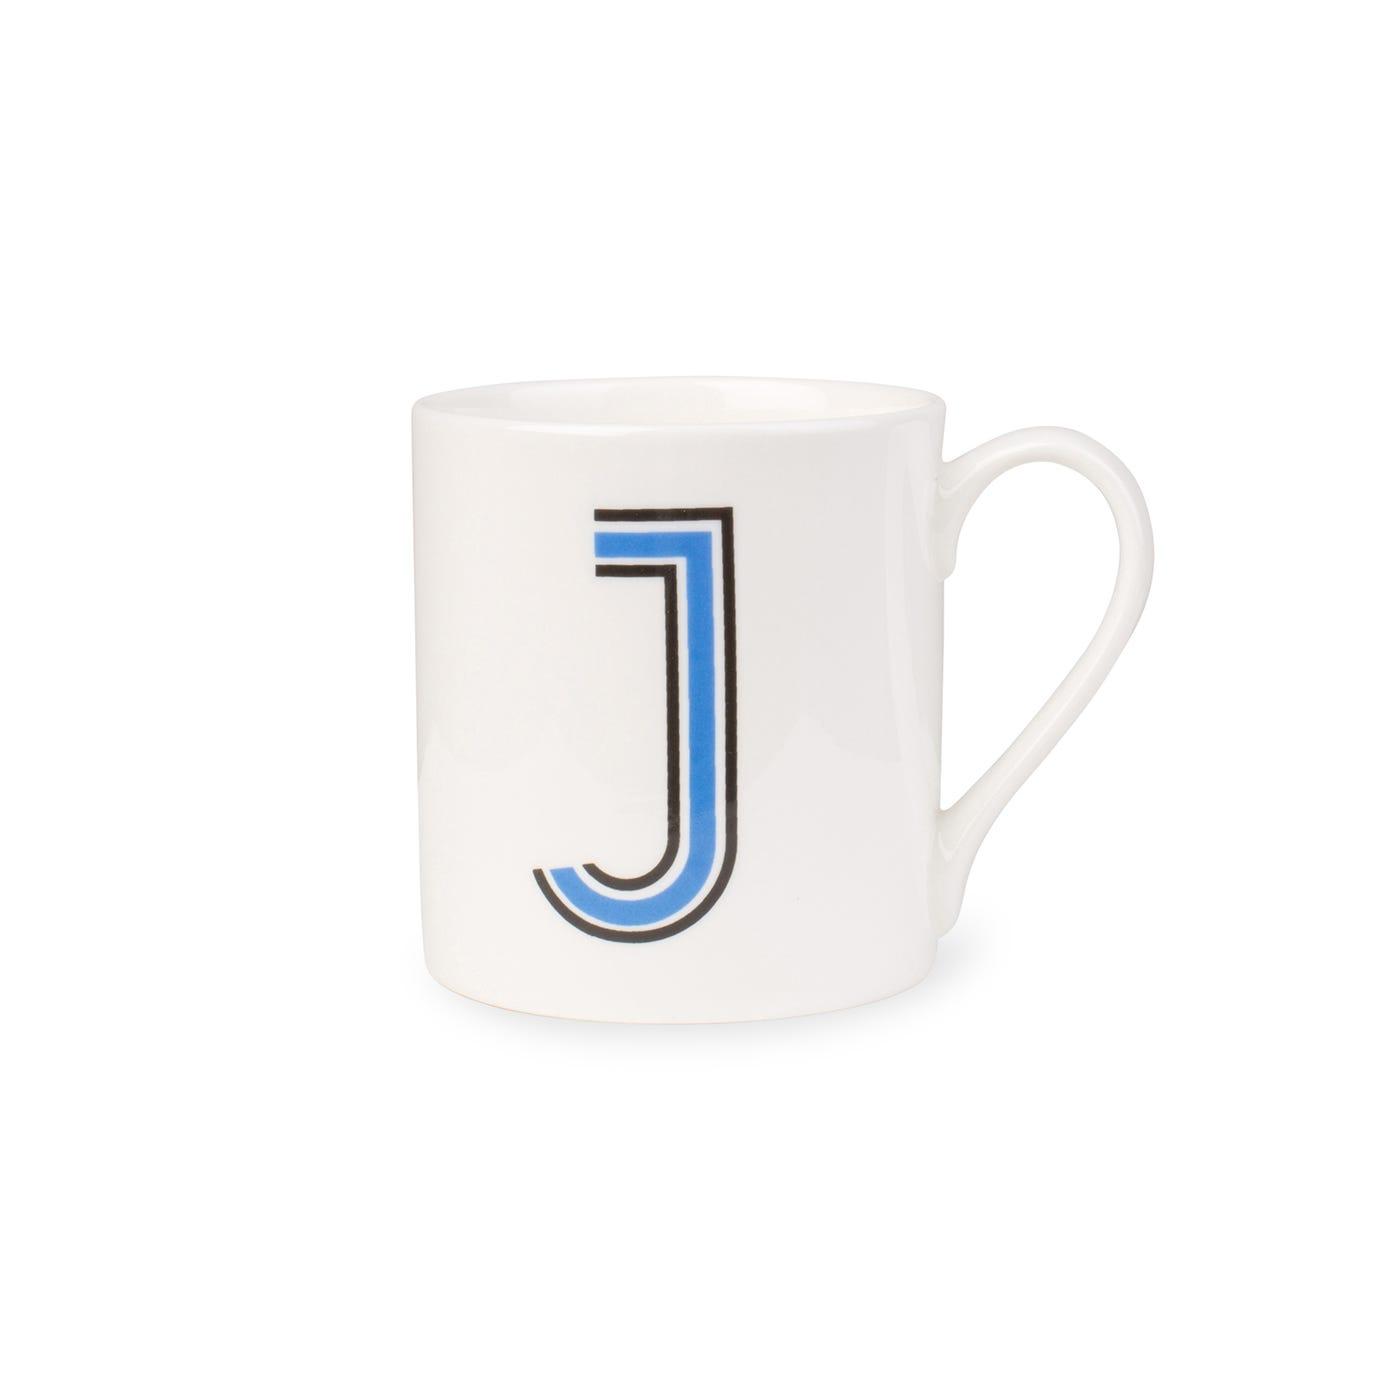 Heal's Heritage Alphabet Mug J